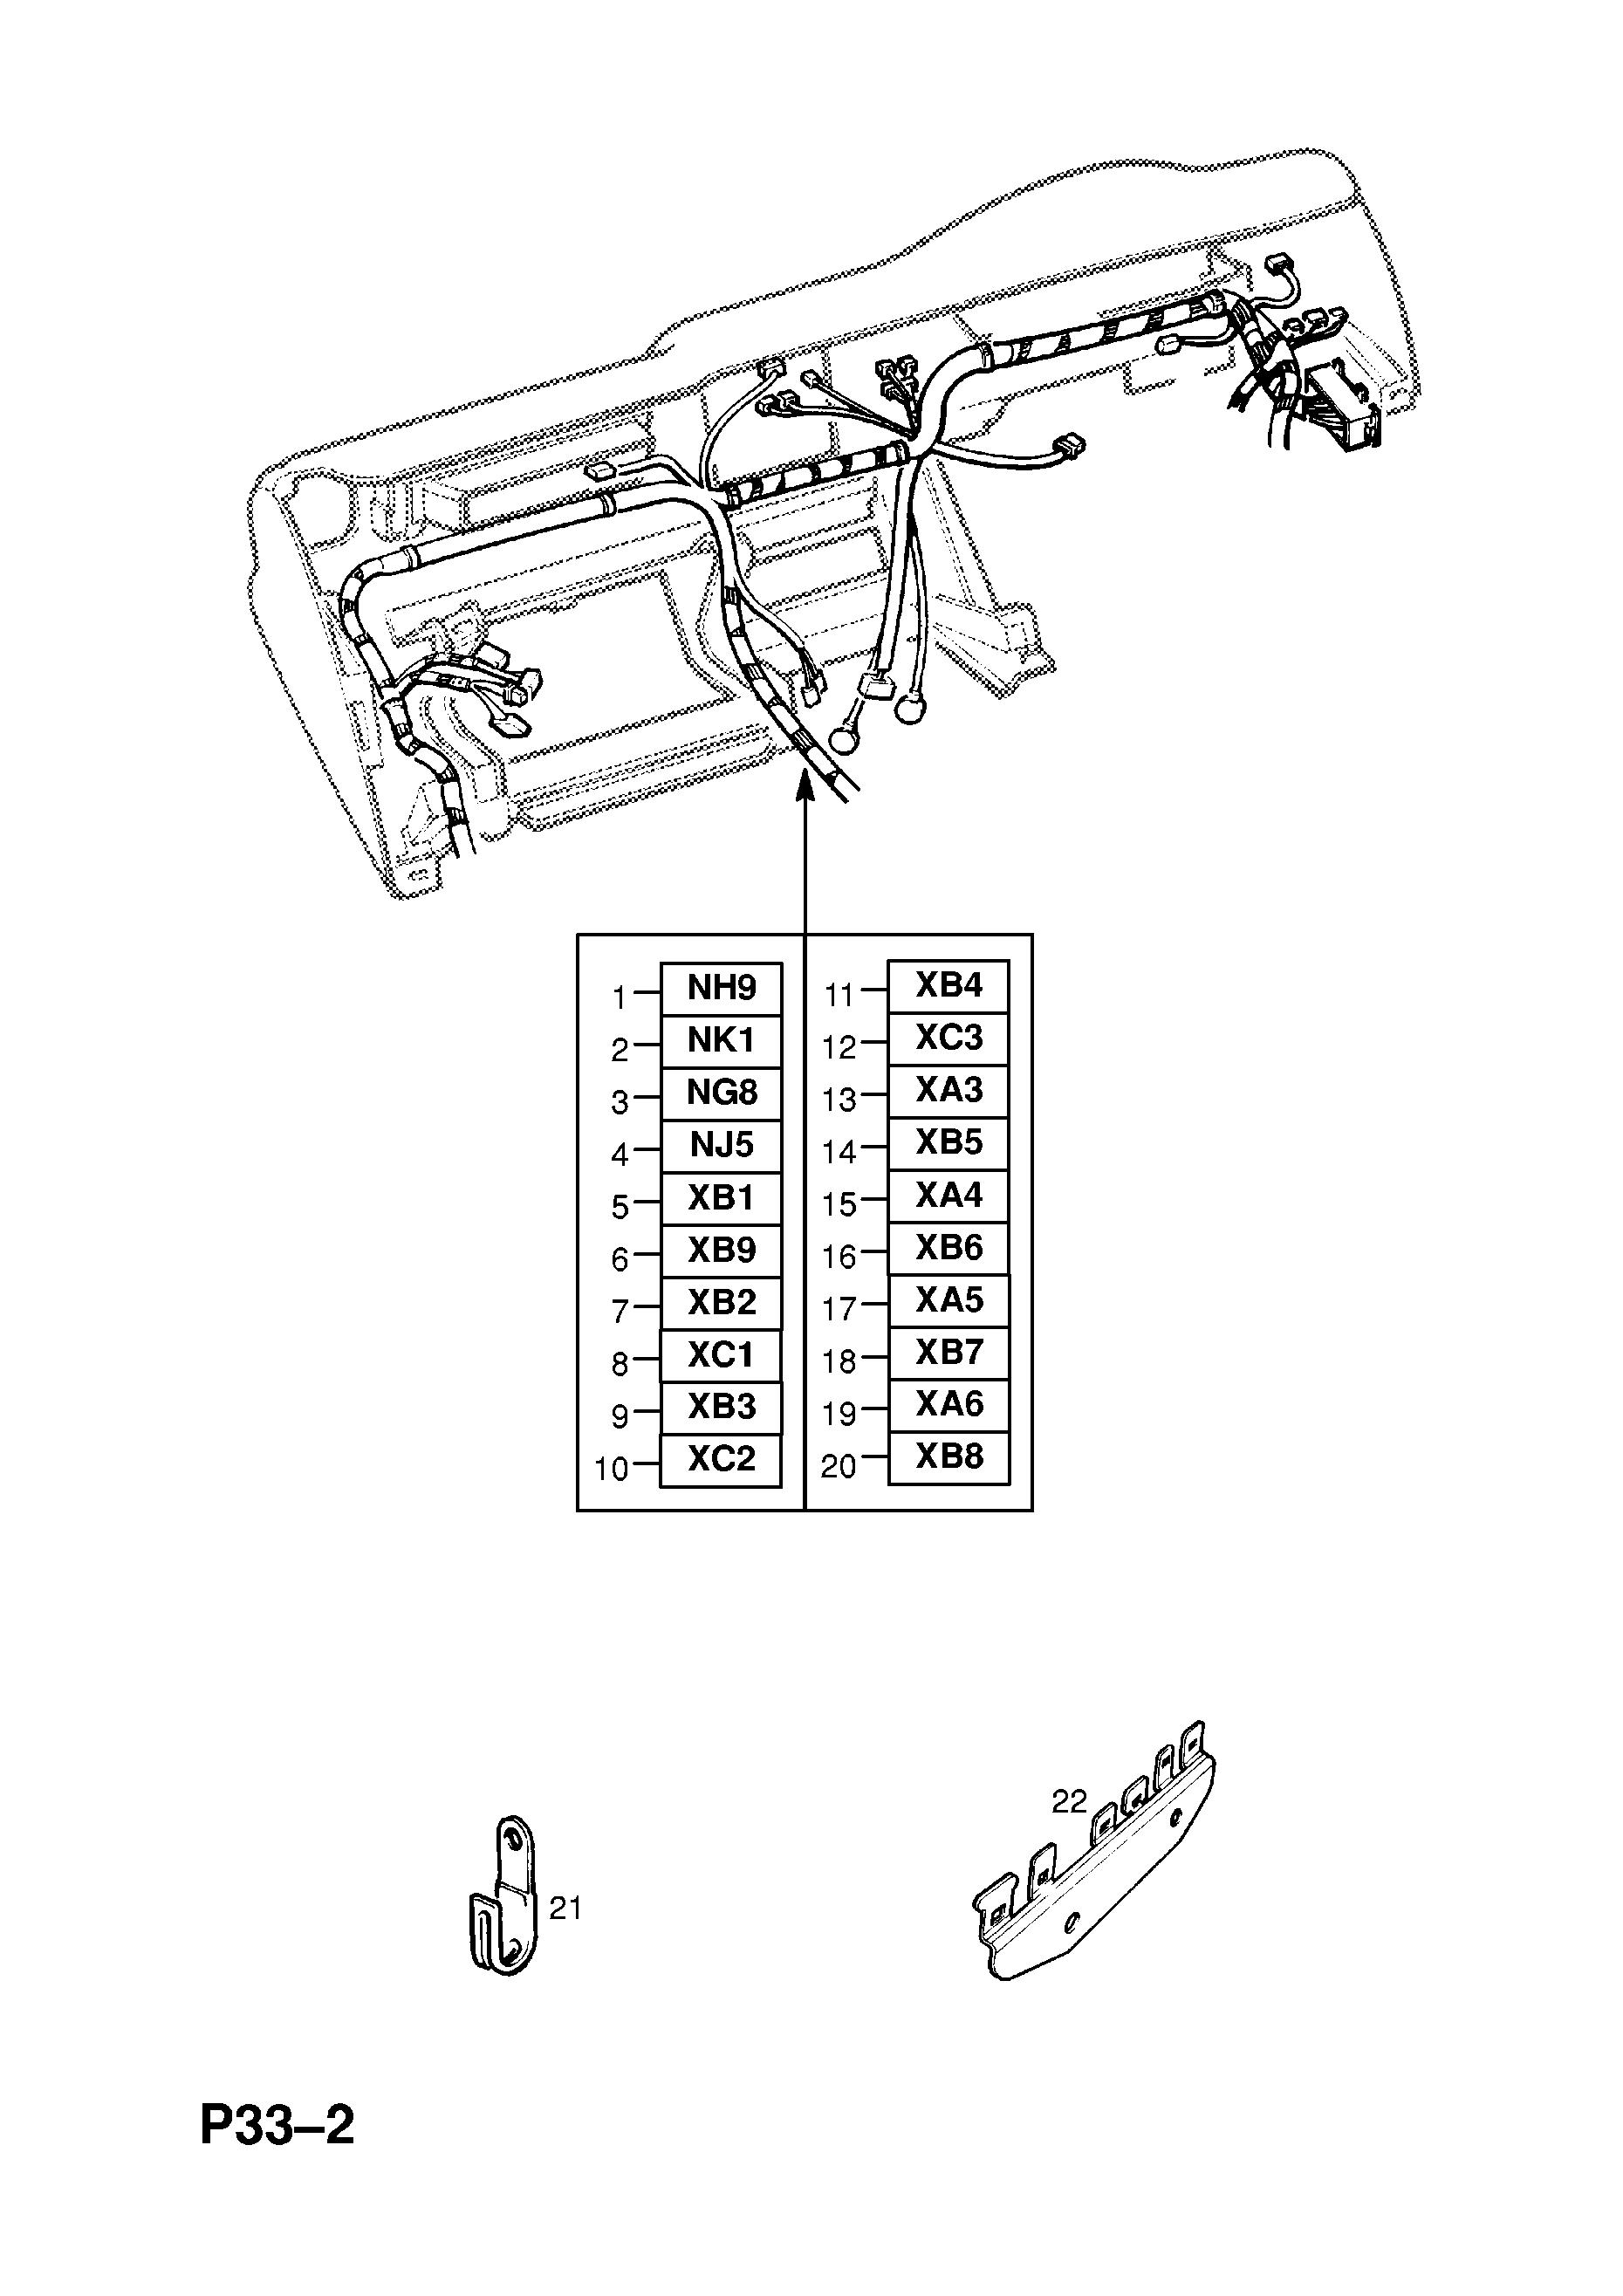 opel frontera-b / spare parts catalog epc